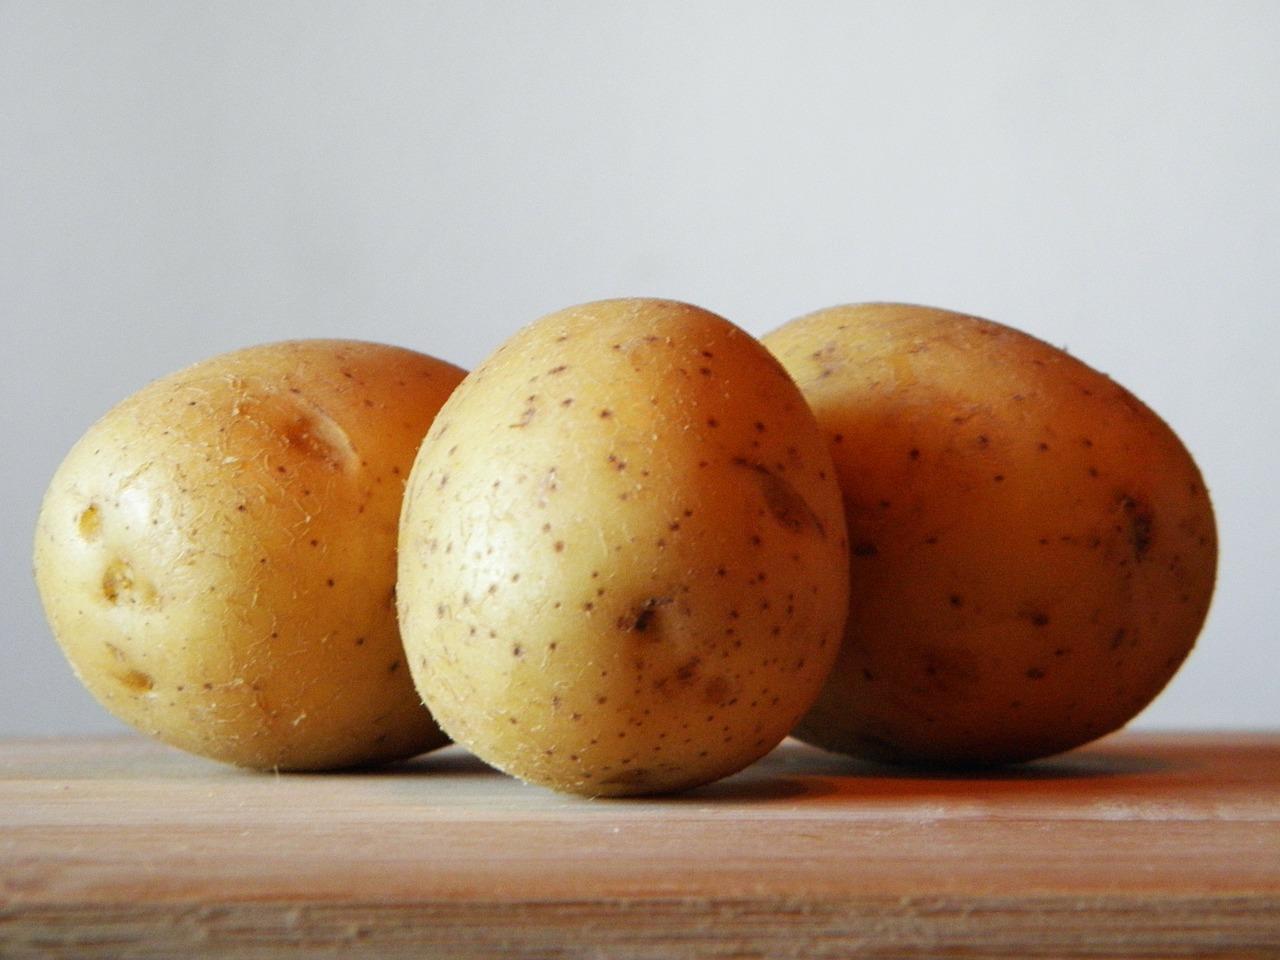 potatoes-179471_1280